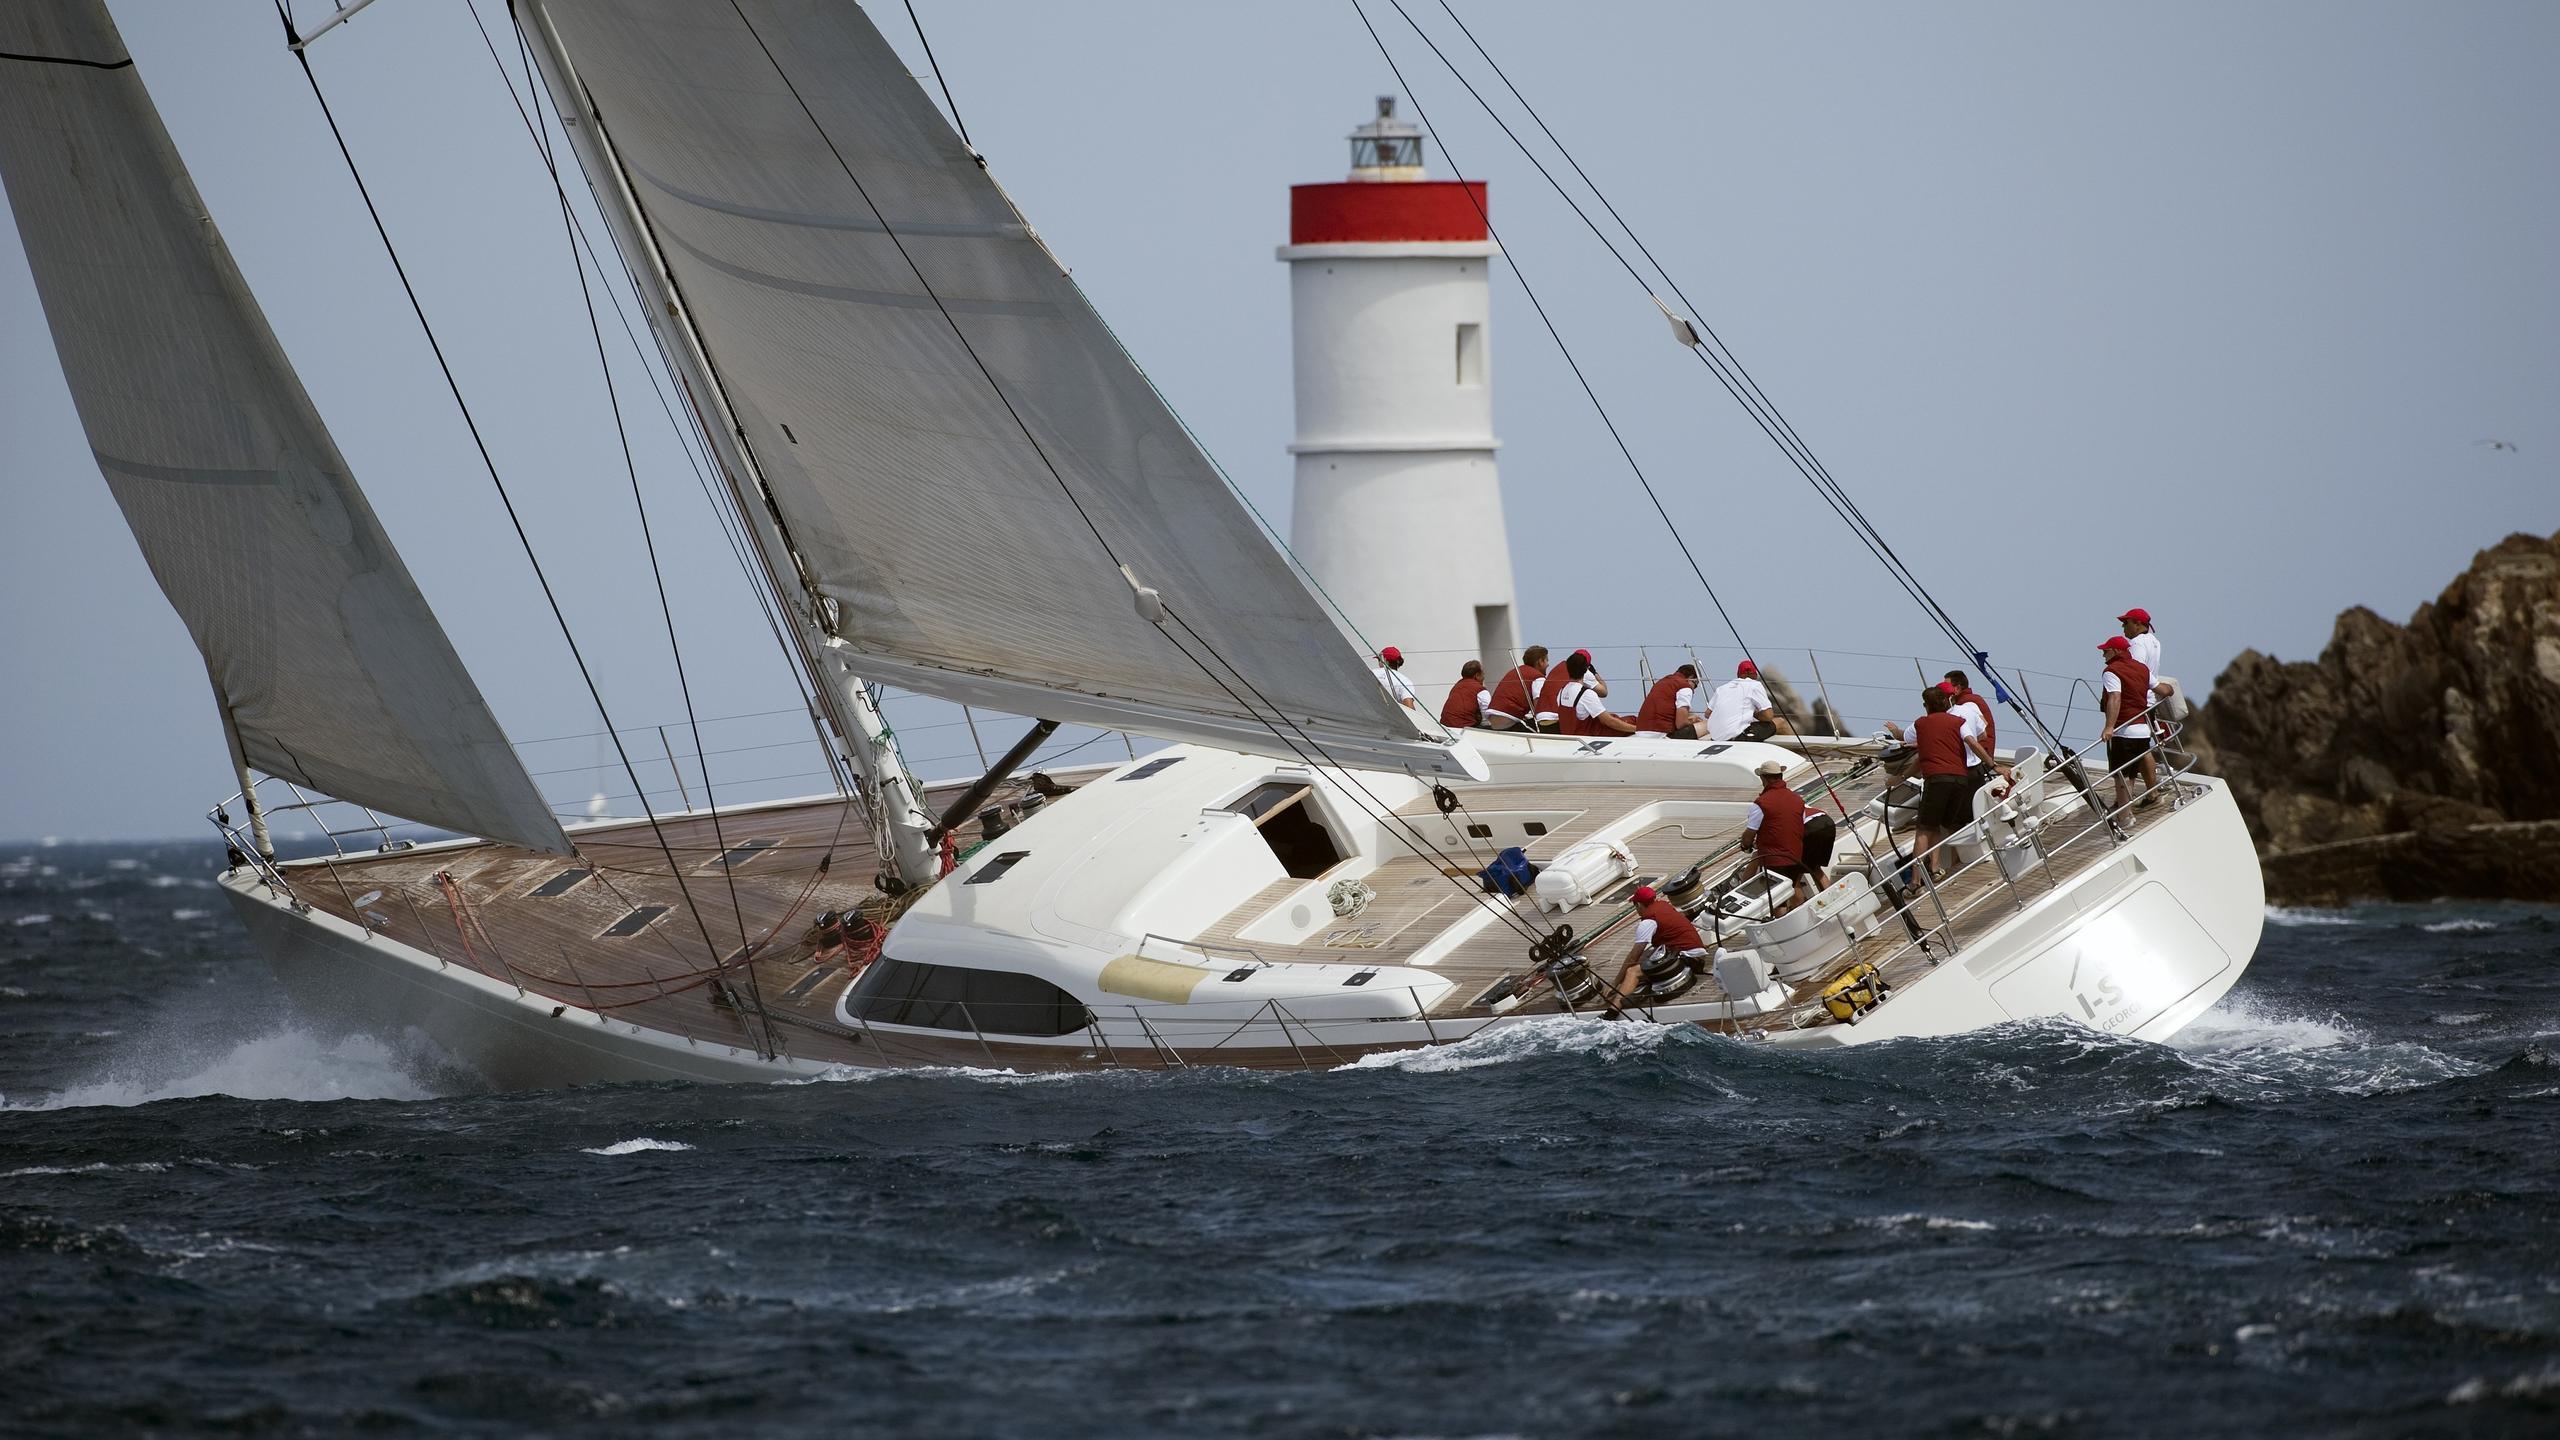 I Sea sailing yacht running aft